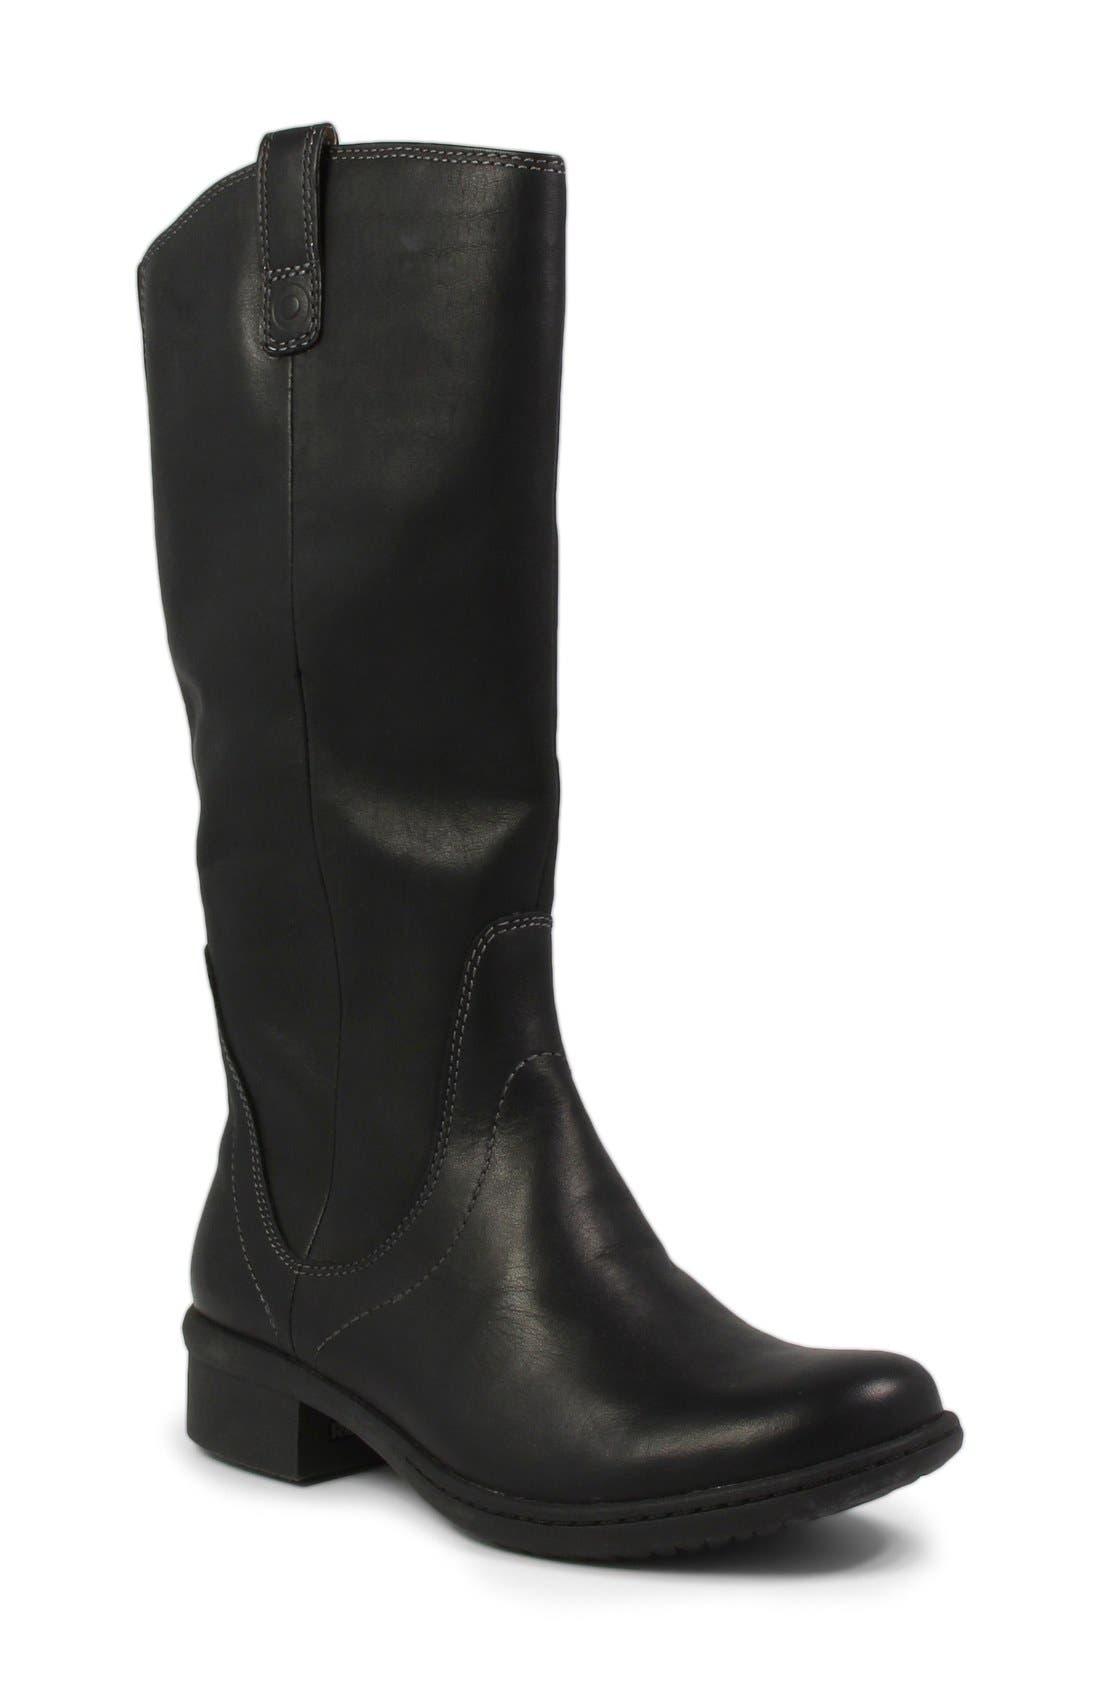 Main Image - Bogs 'Kristina' Waterproof Tall Boot (Women)